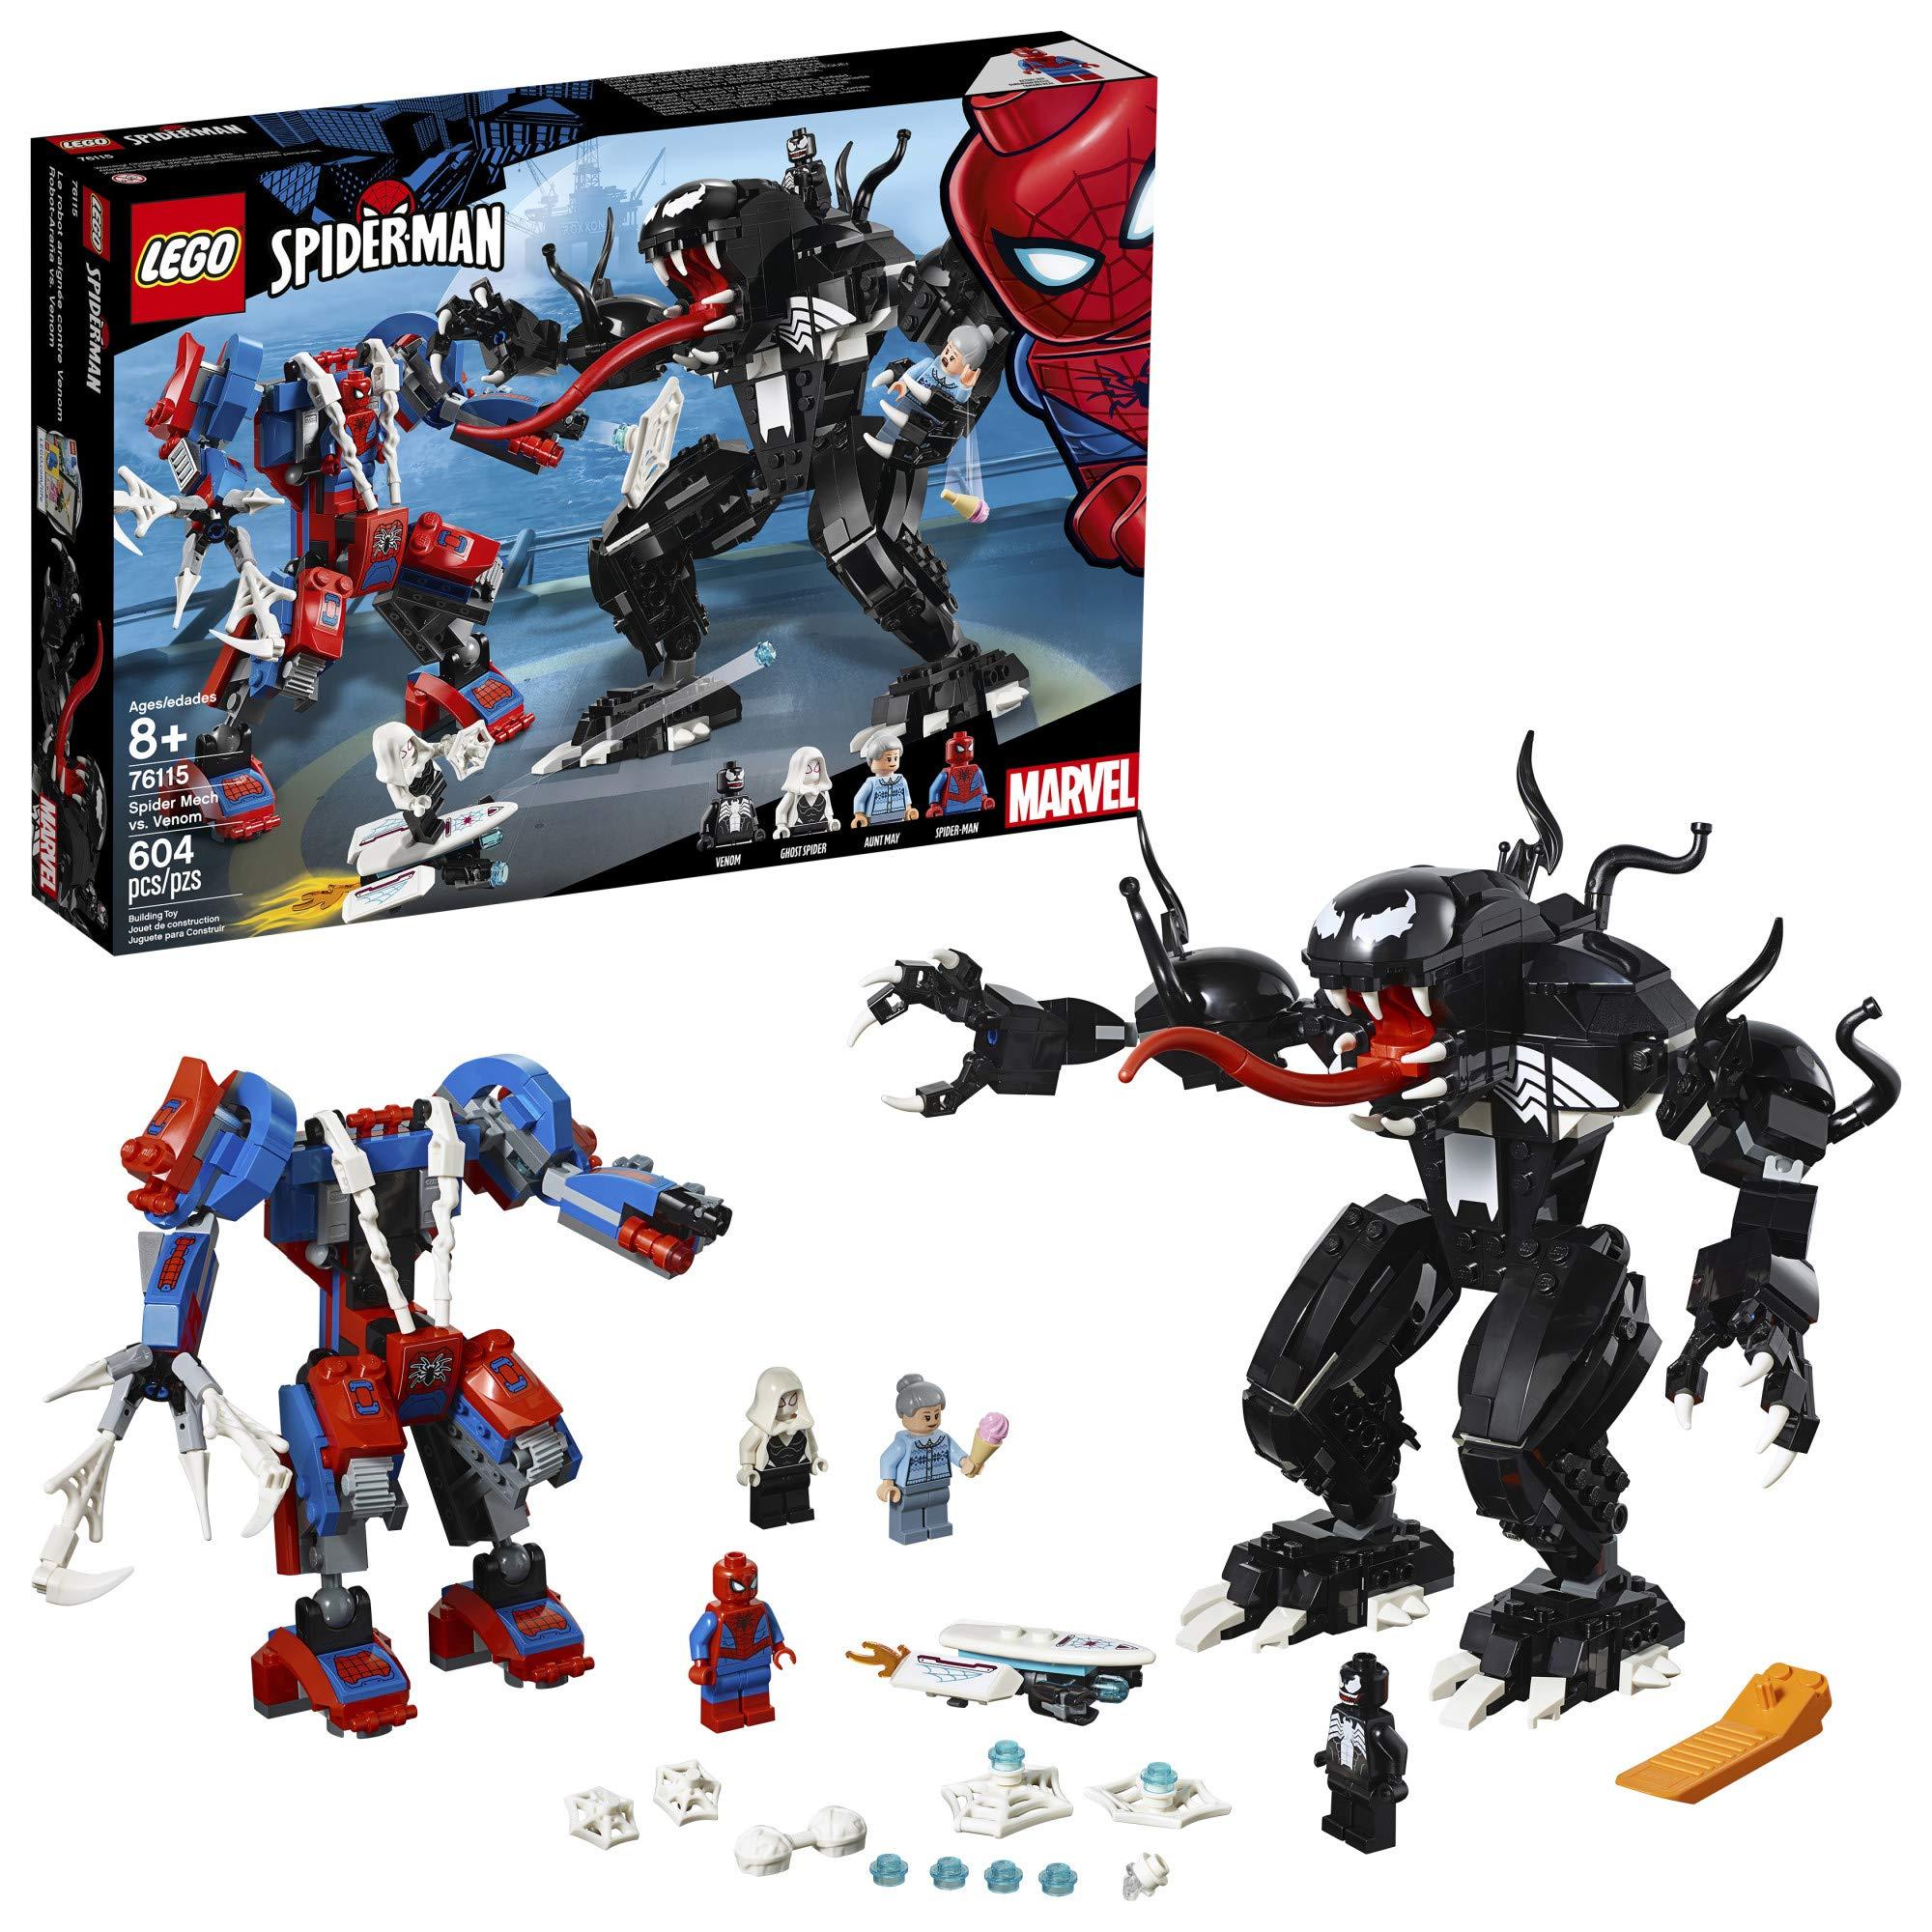 LEGO 6251077 Marvel Spider Mech Vs. Venom 76115 Building Kit (604 Piece), Multicolor